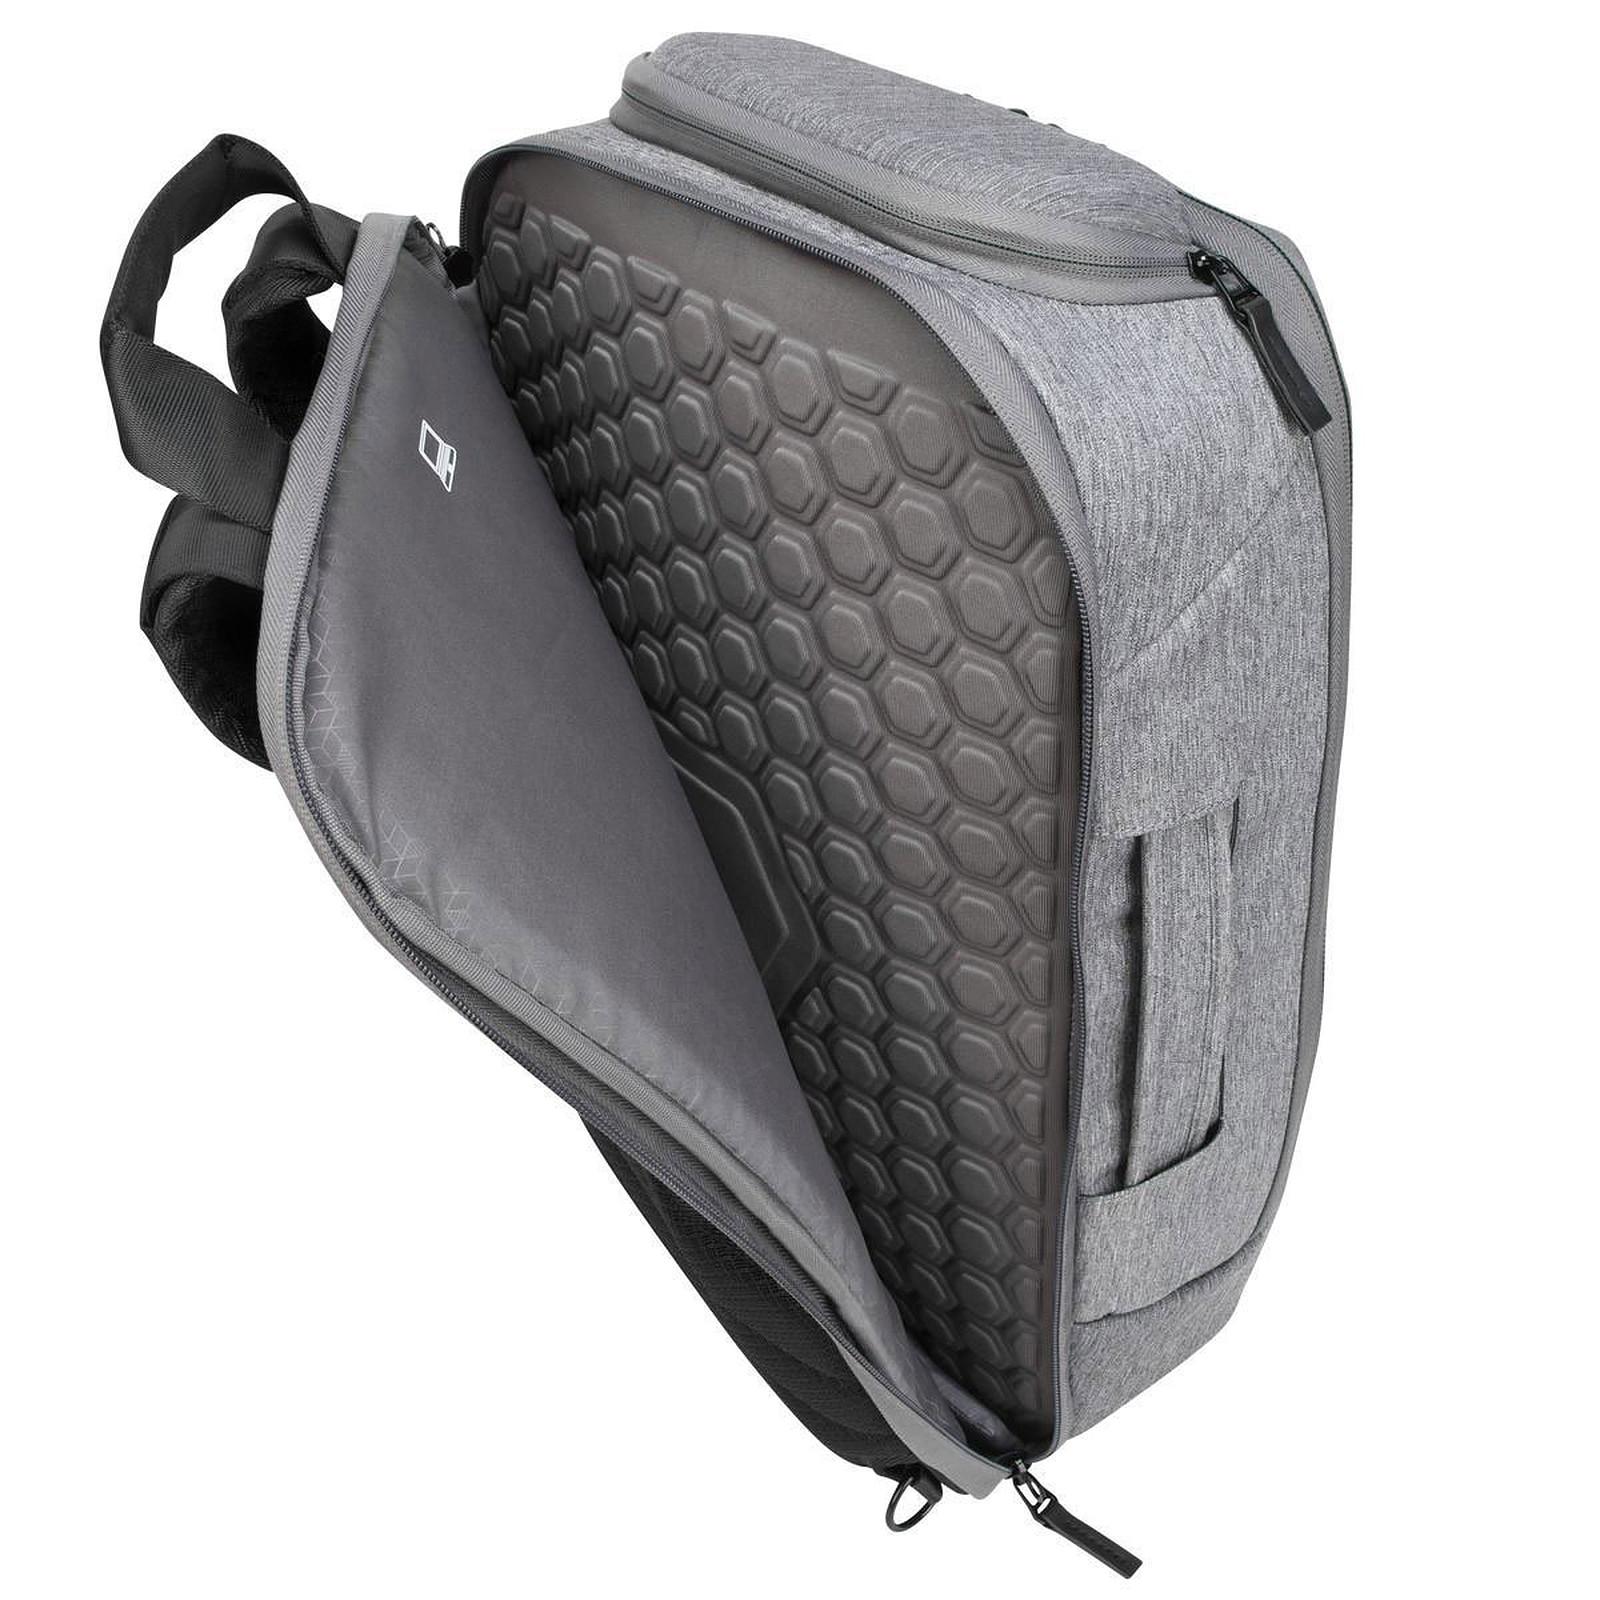 Citylite Premium Targus Pro Backpack SacSacocheHousse rtsQdhCx